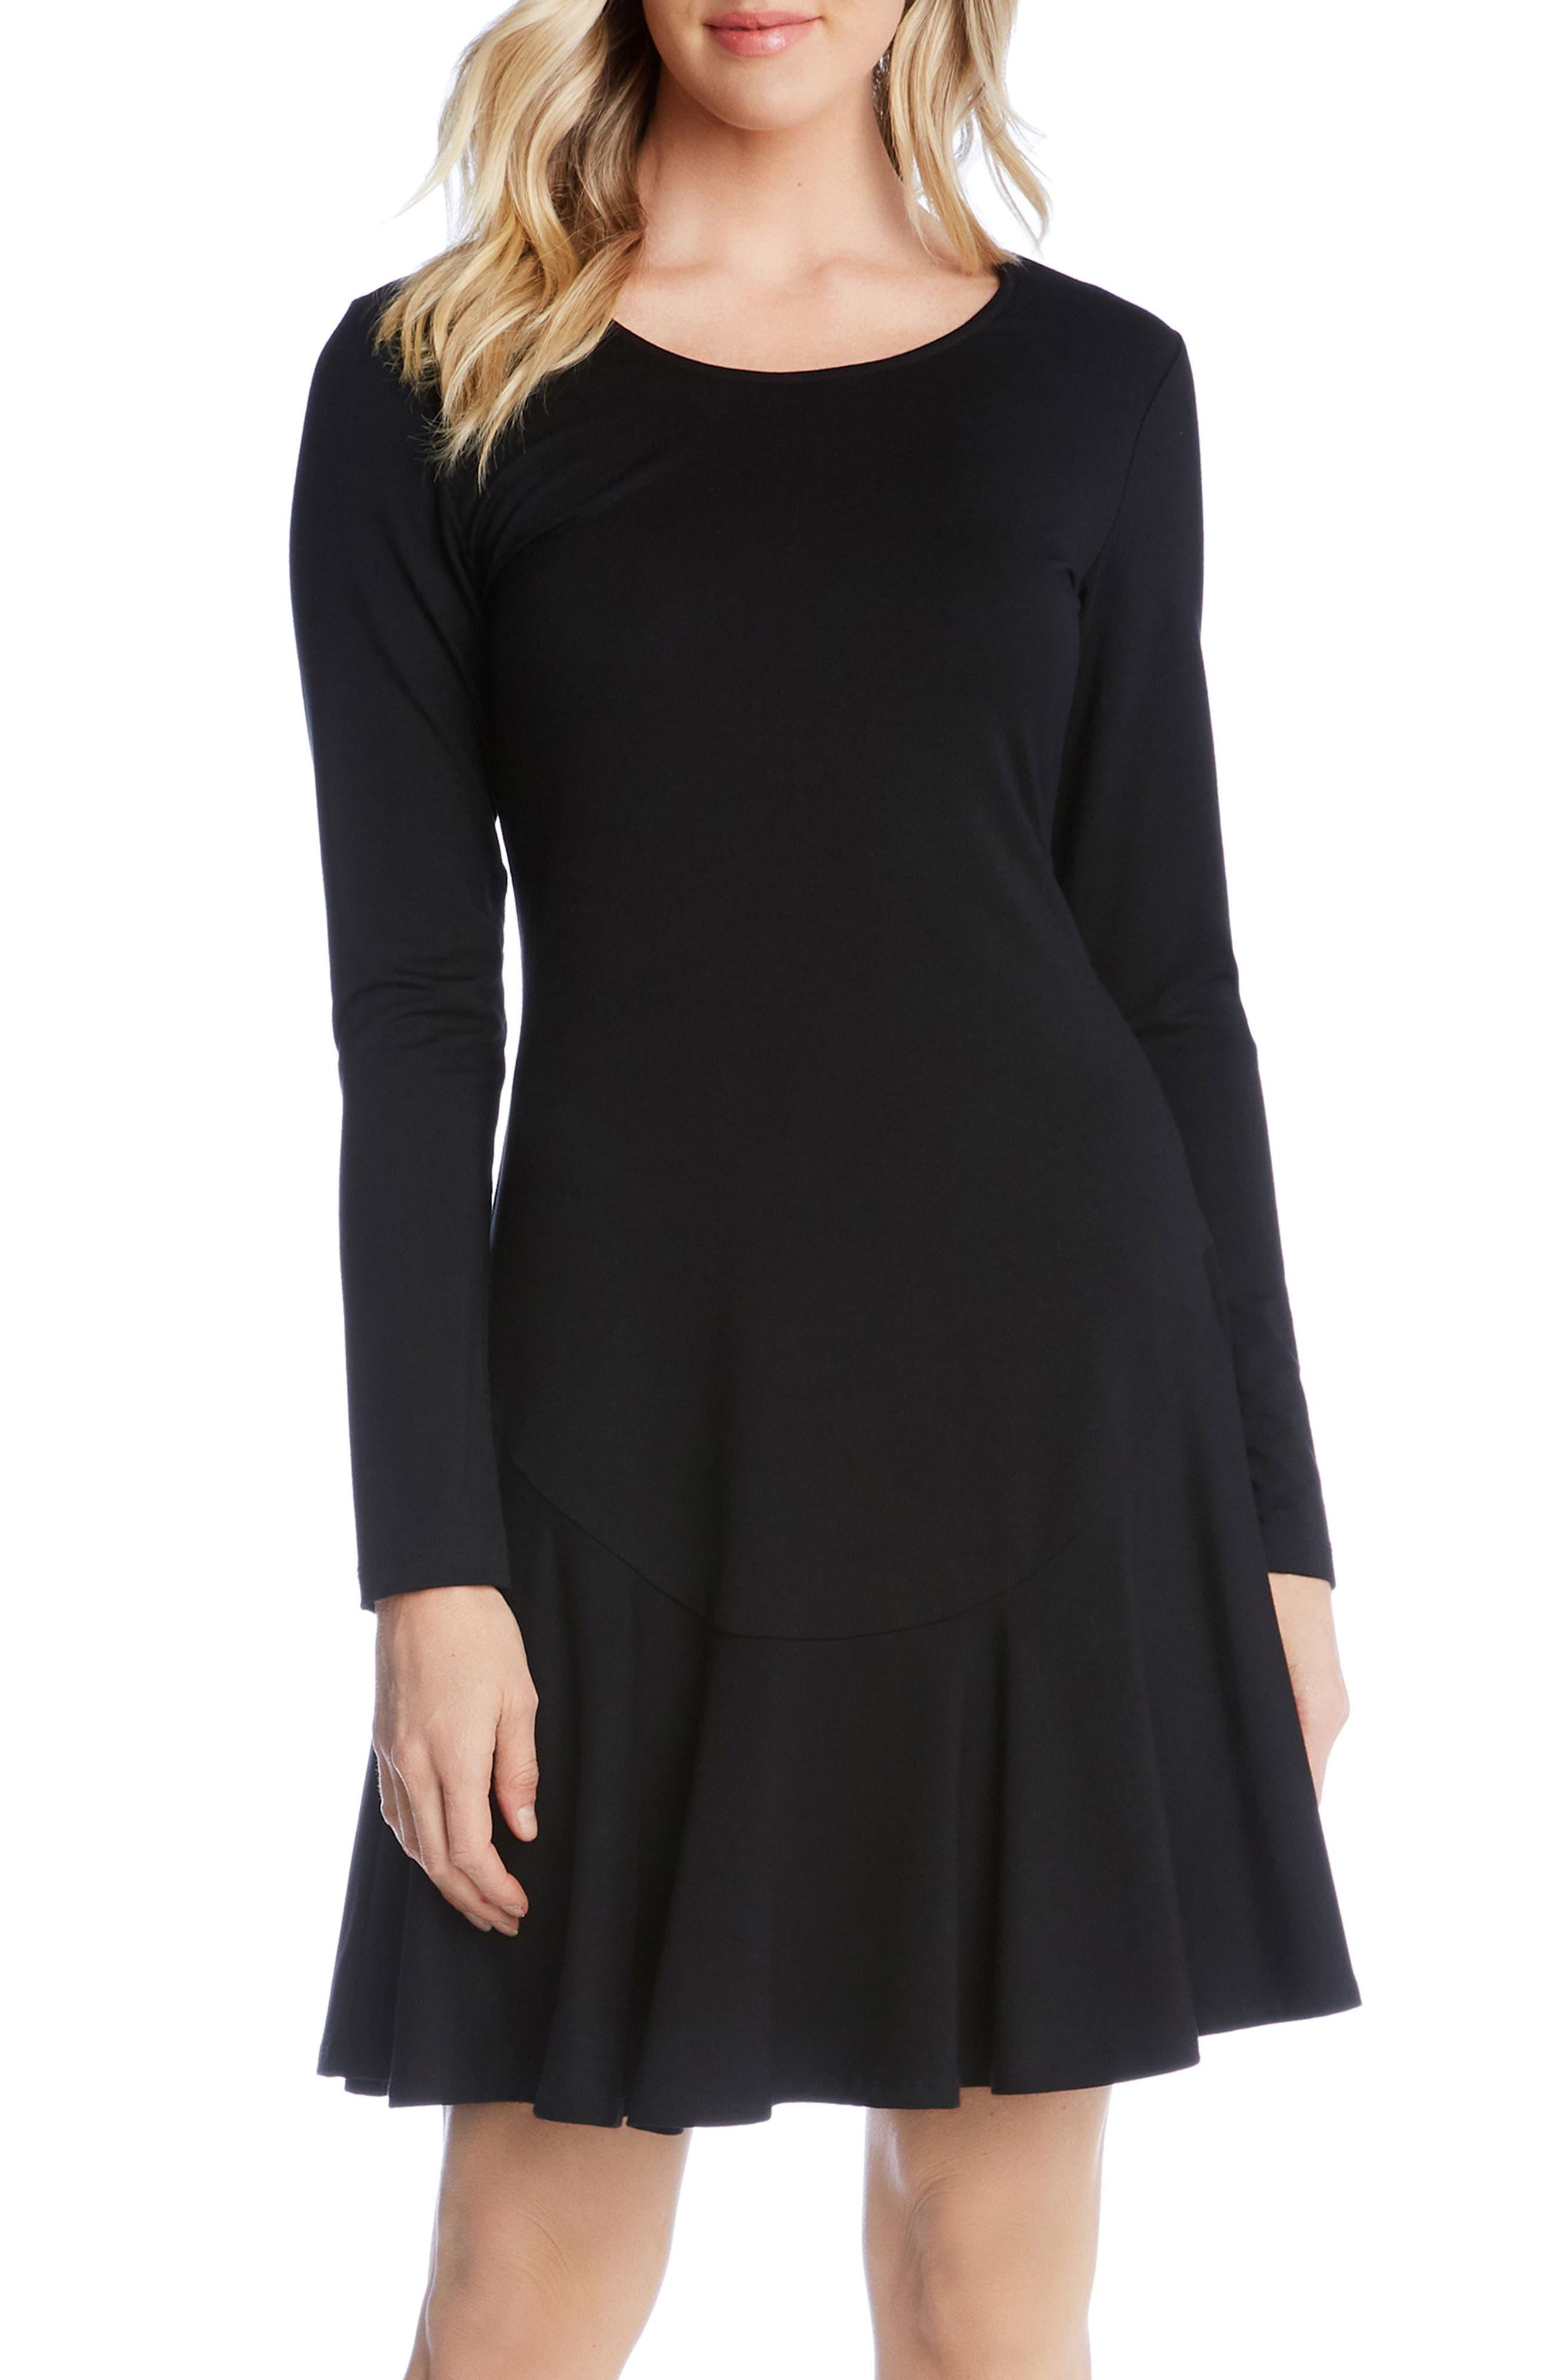 KAREN KANE, Dakota Ruffle Hem A-Line Dress, Alternate thumbnail 4, color, BLACK